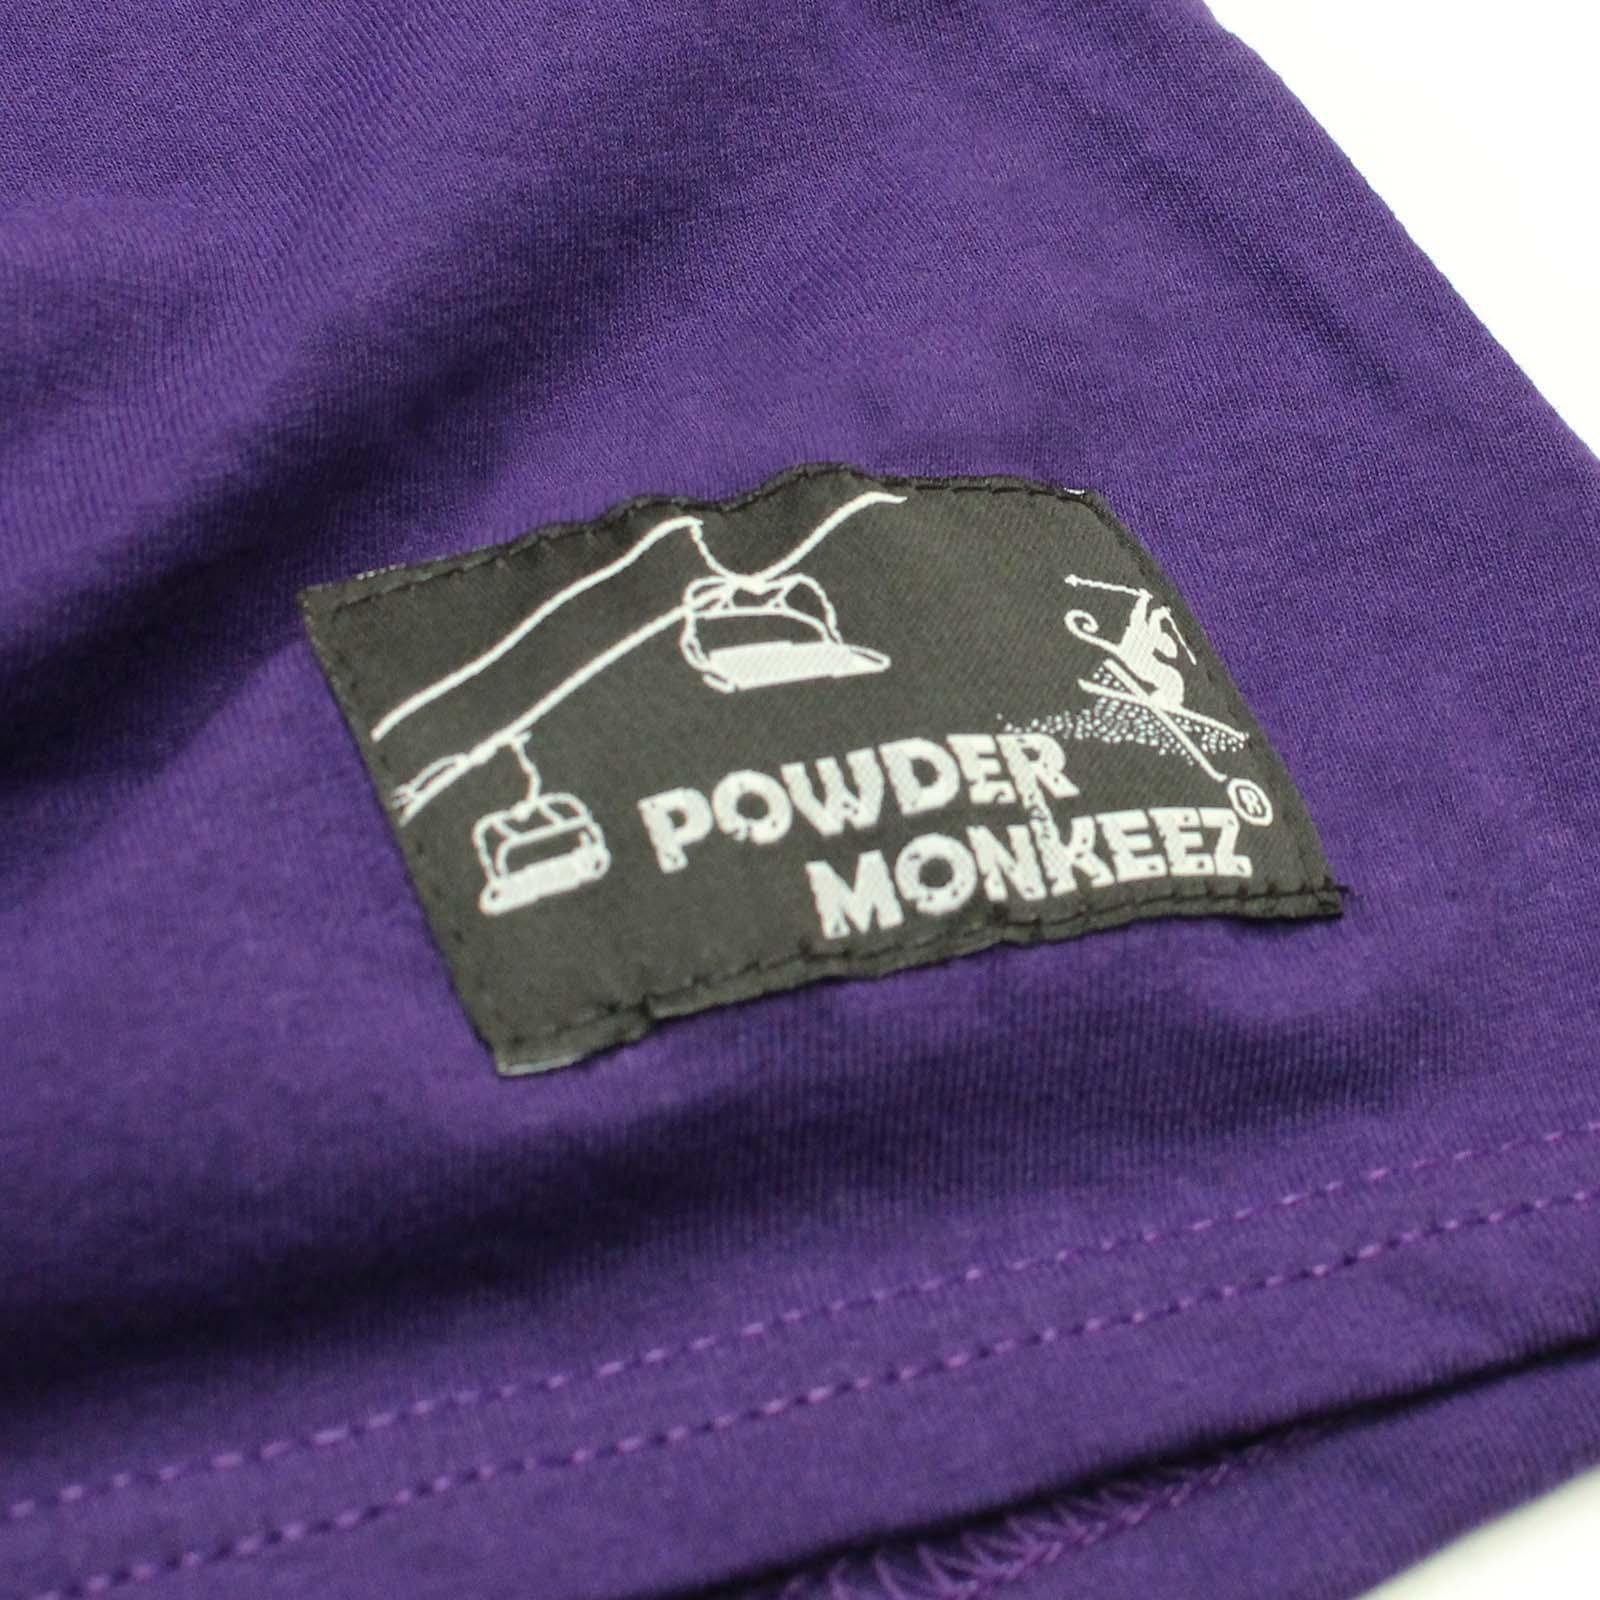 Sci Donna T-shirt Bere Sci Divertente Top Compleanno Tee per lui T Shirt T-shirt